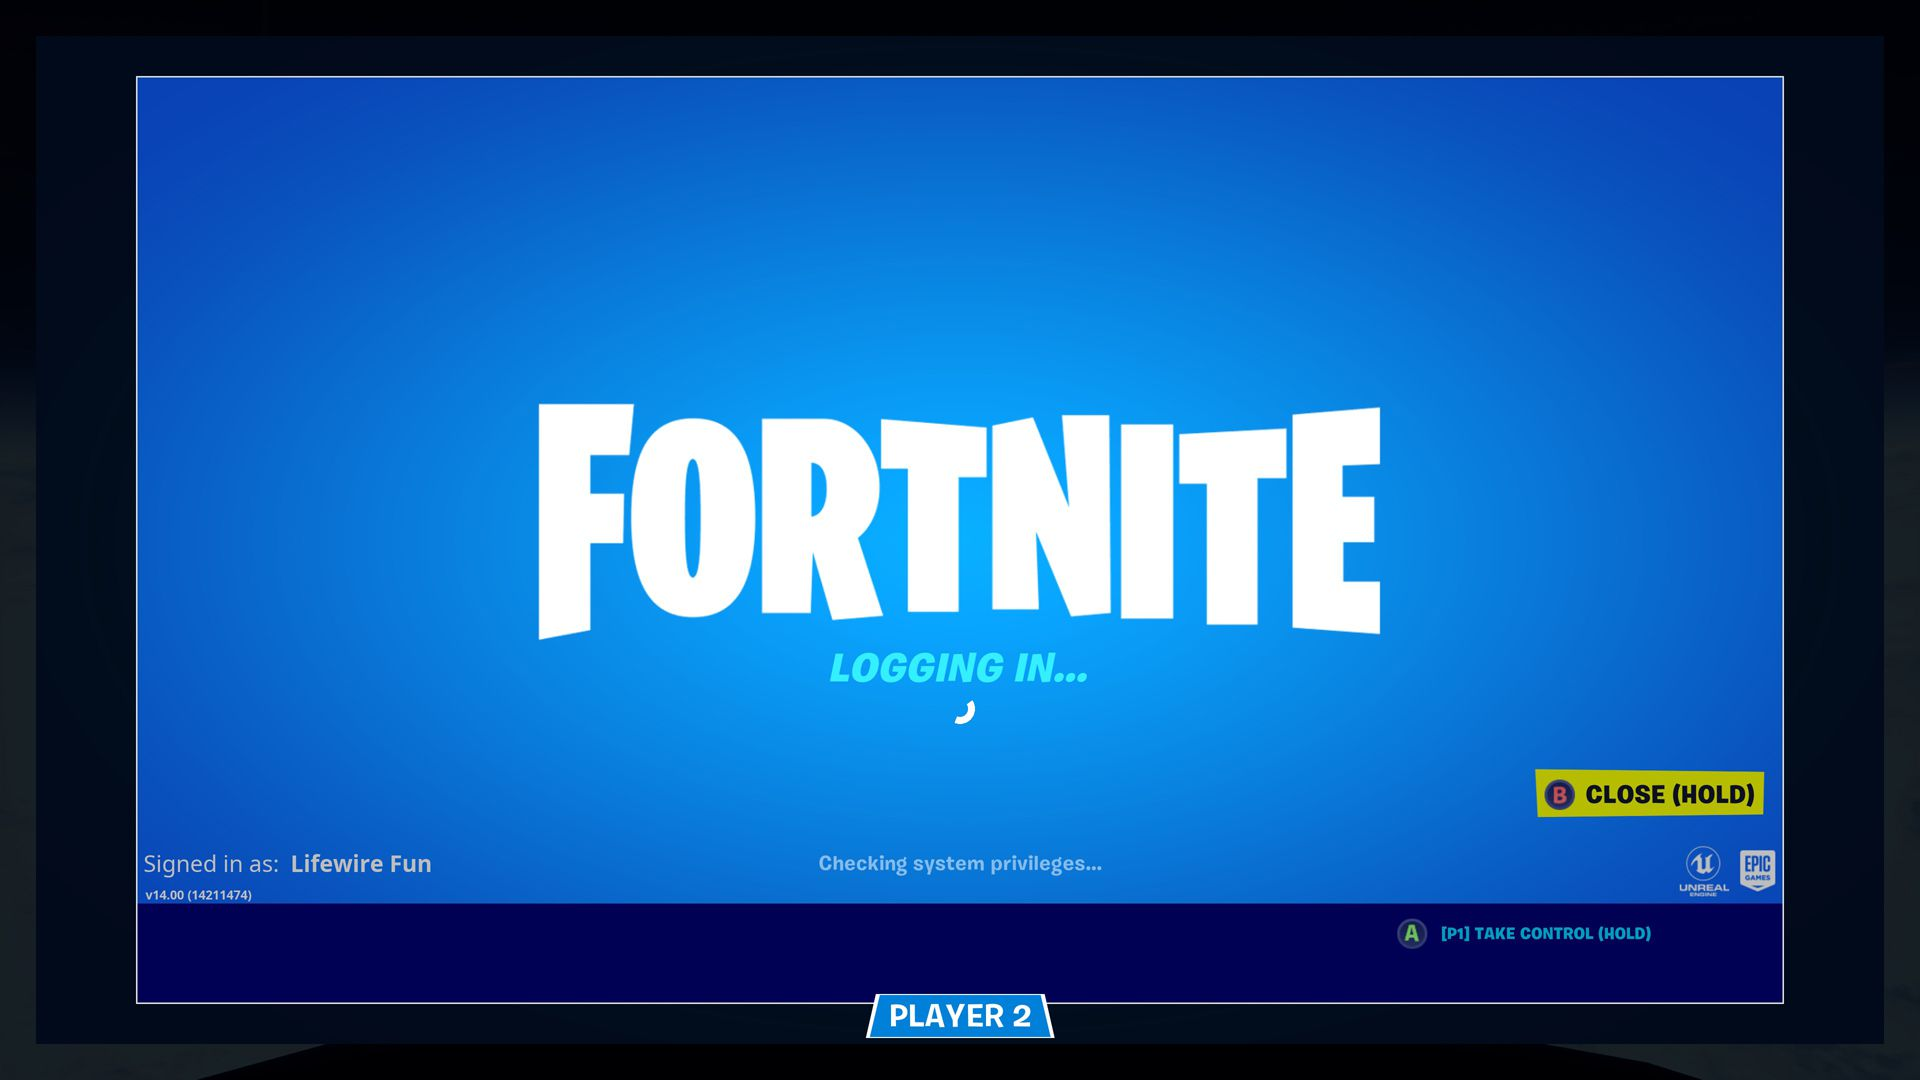 Fortnite video game on Xbox One.